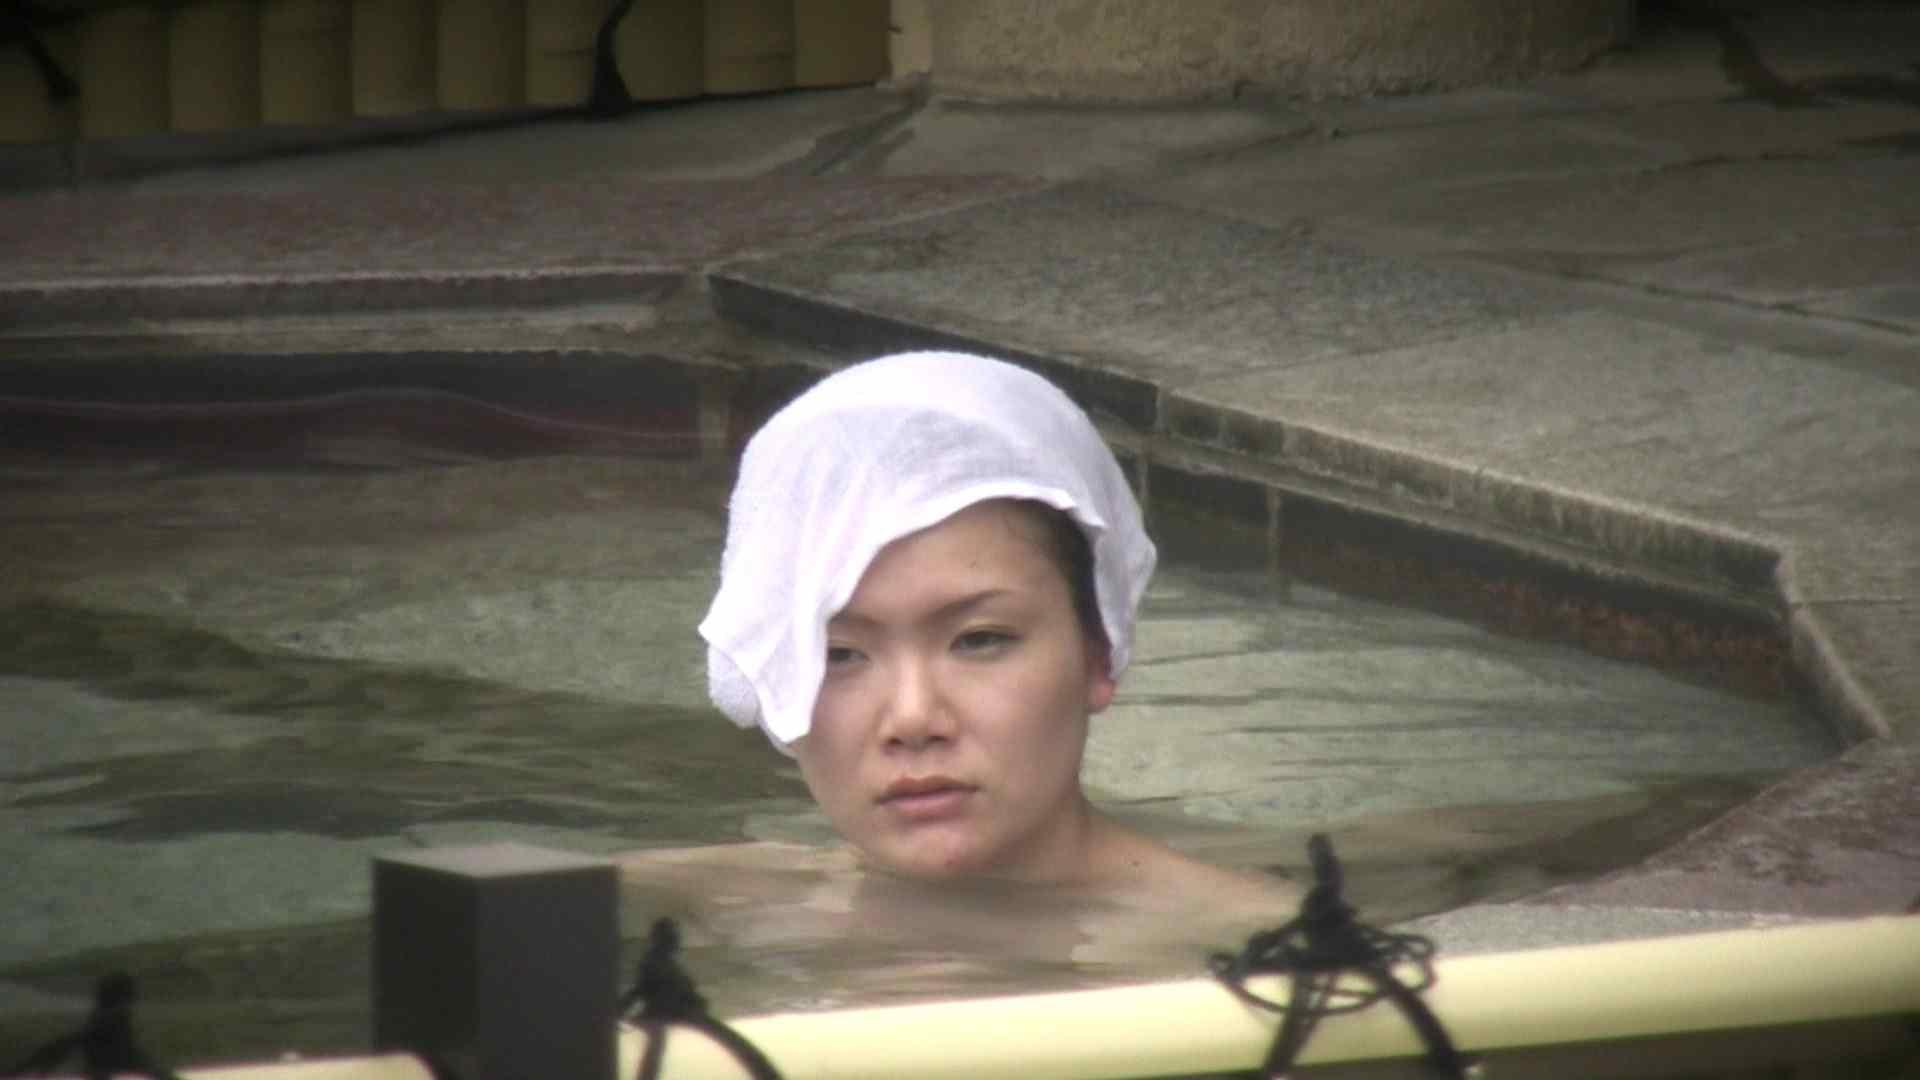 Aquaな露天風呂Vol.12【VIP】 盗撮師作品 セックス画像 78pic 77